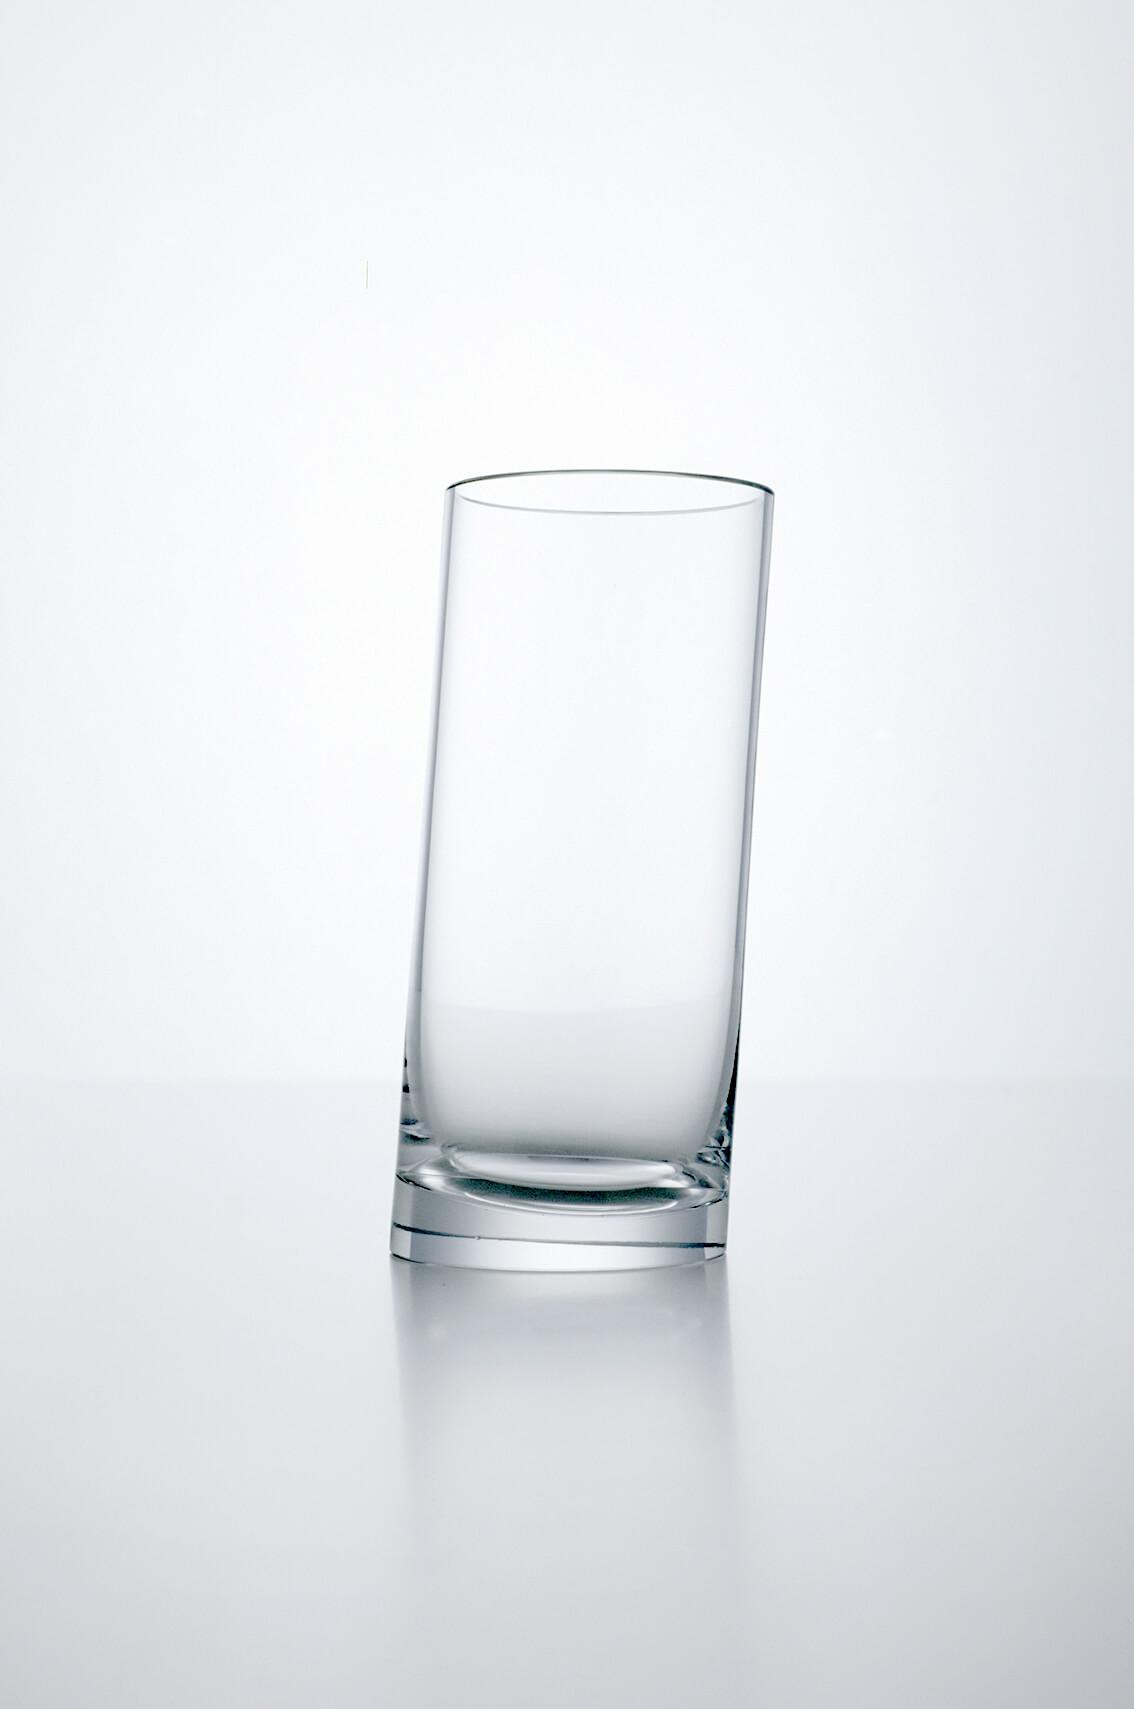 lucyd_SCOTT_glass_3_hochkant Kopie